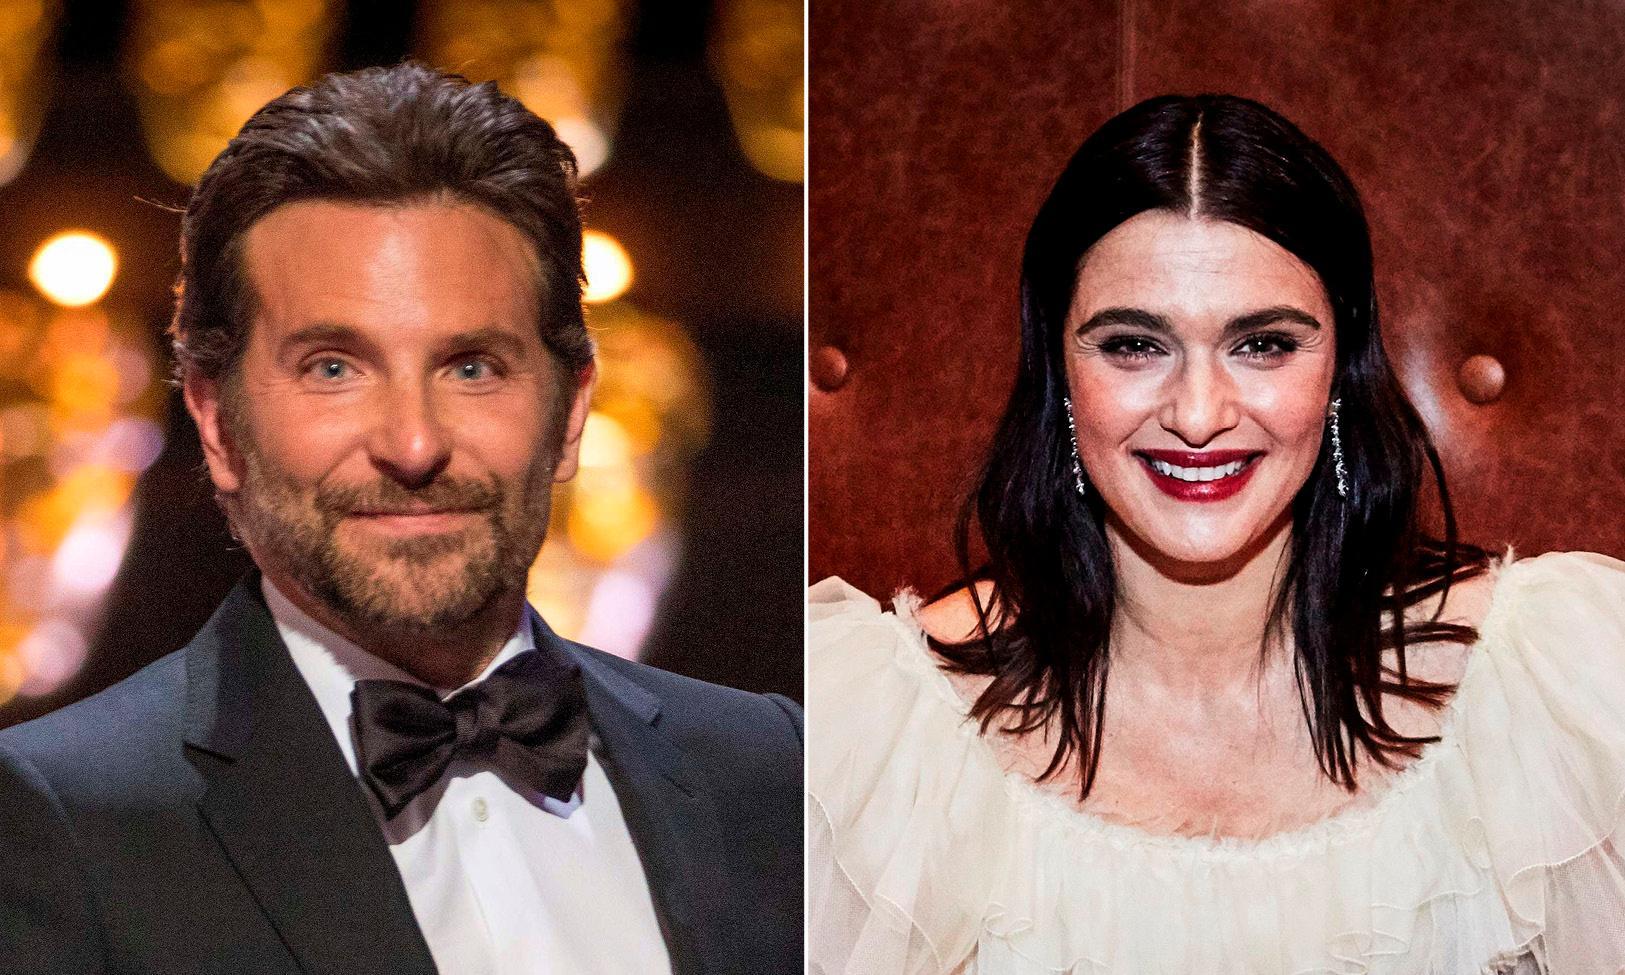 Rachel Weisz spitting? Bradley Cooper wincing? 2019's Oscar memes